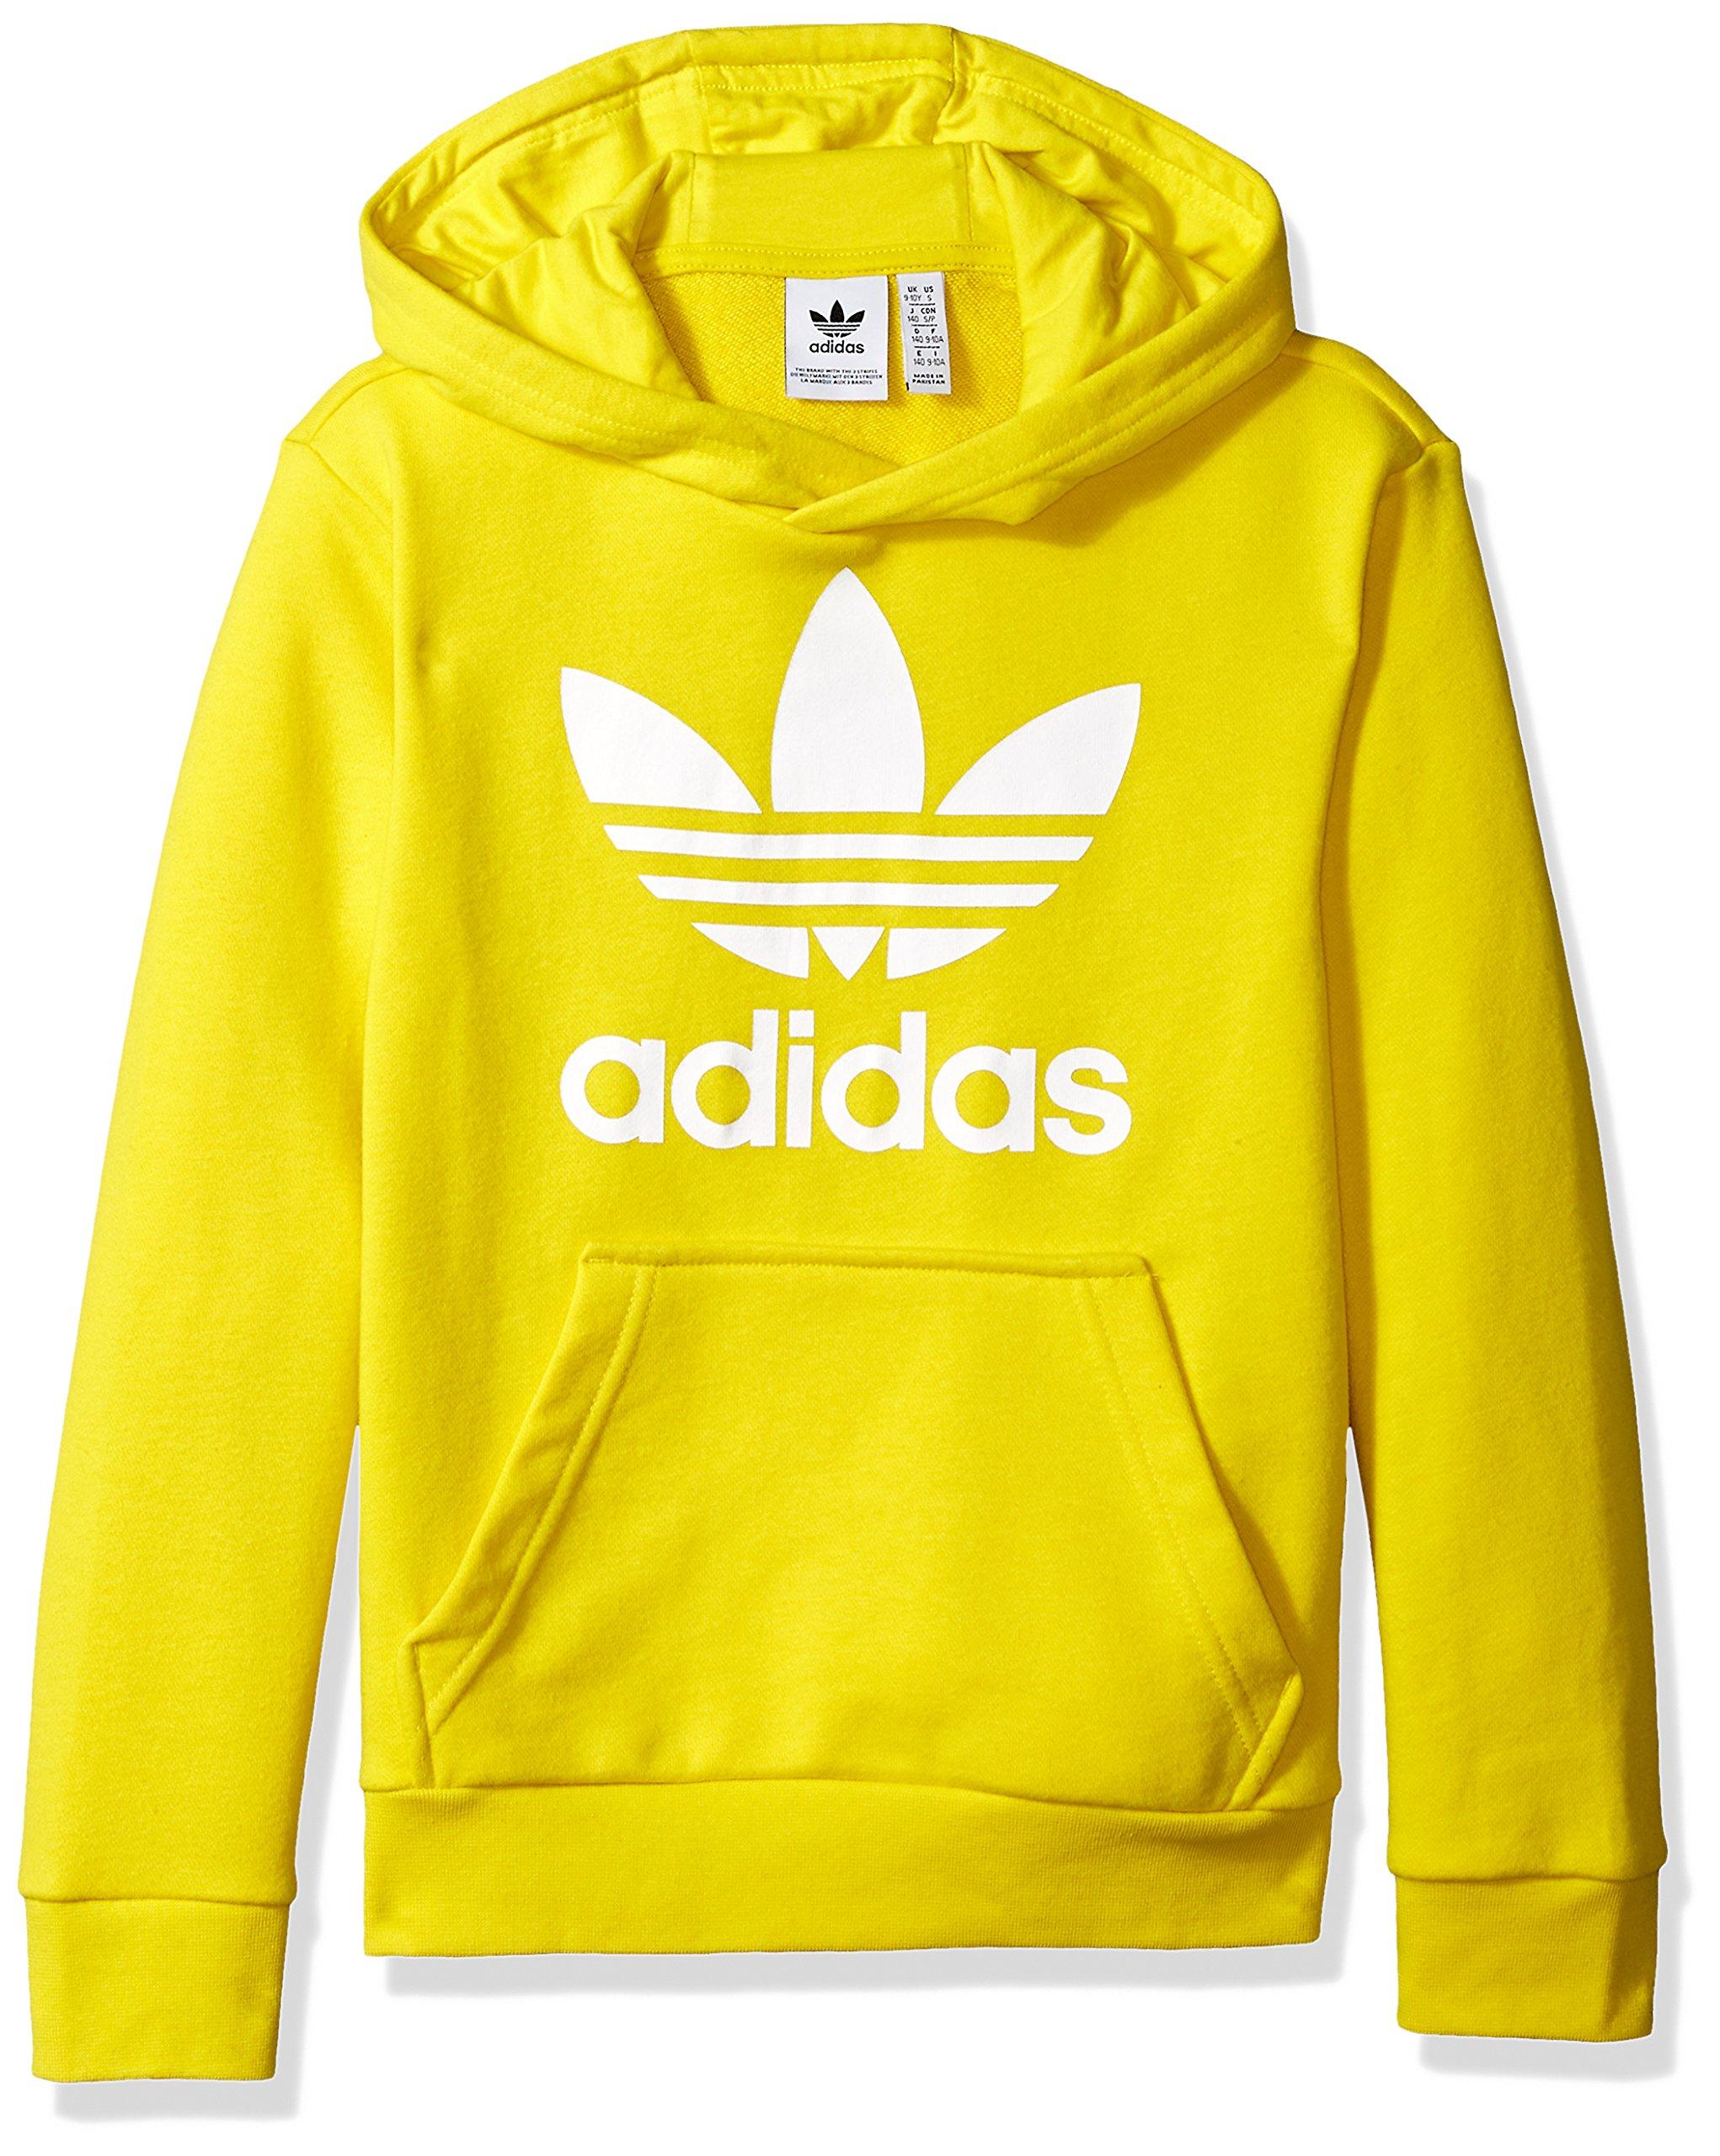 d10aba491 Galleon - Adidas Originals Kids' Big Originals Trefoil Hoodie,  Yellow/White, M